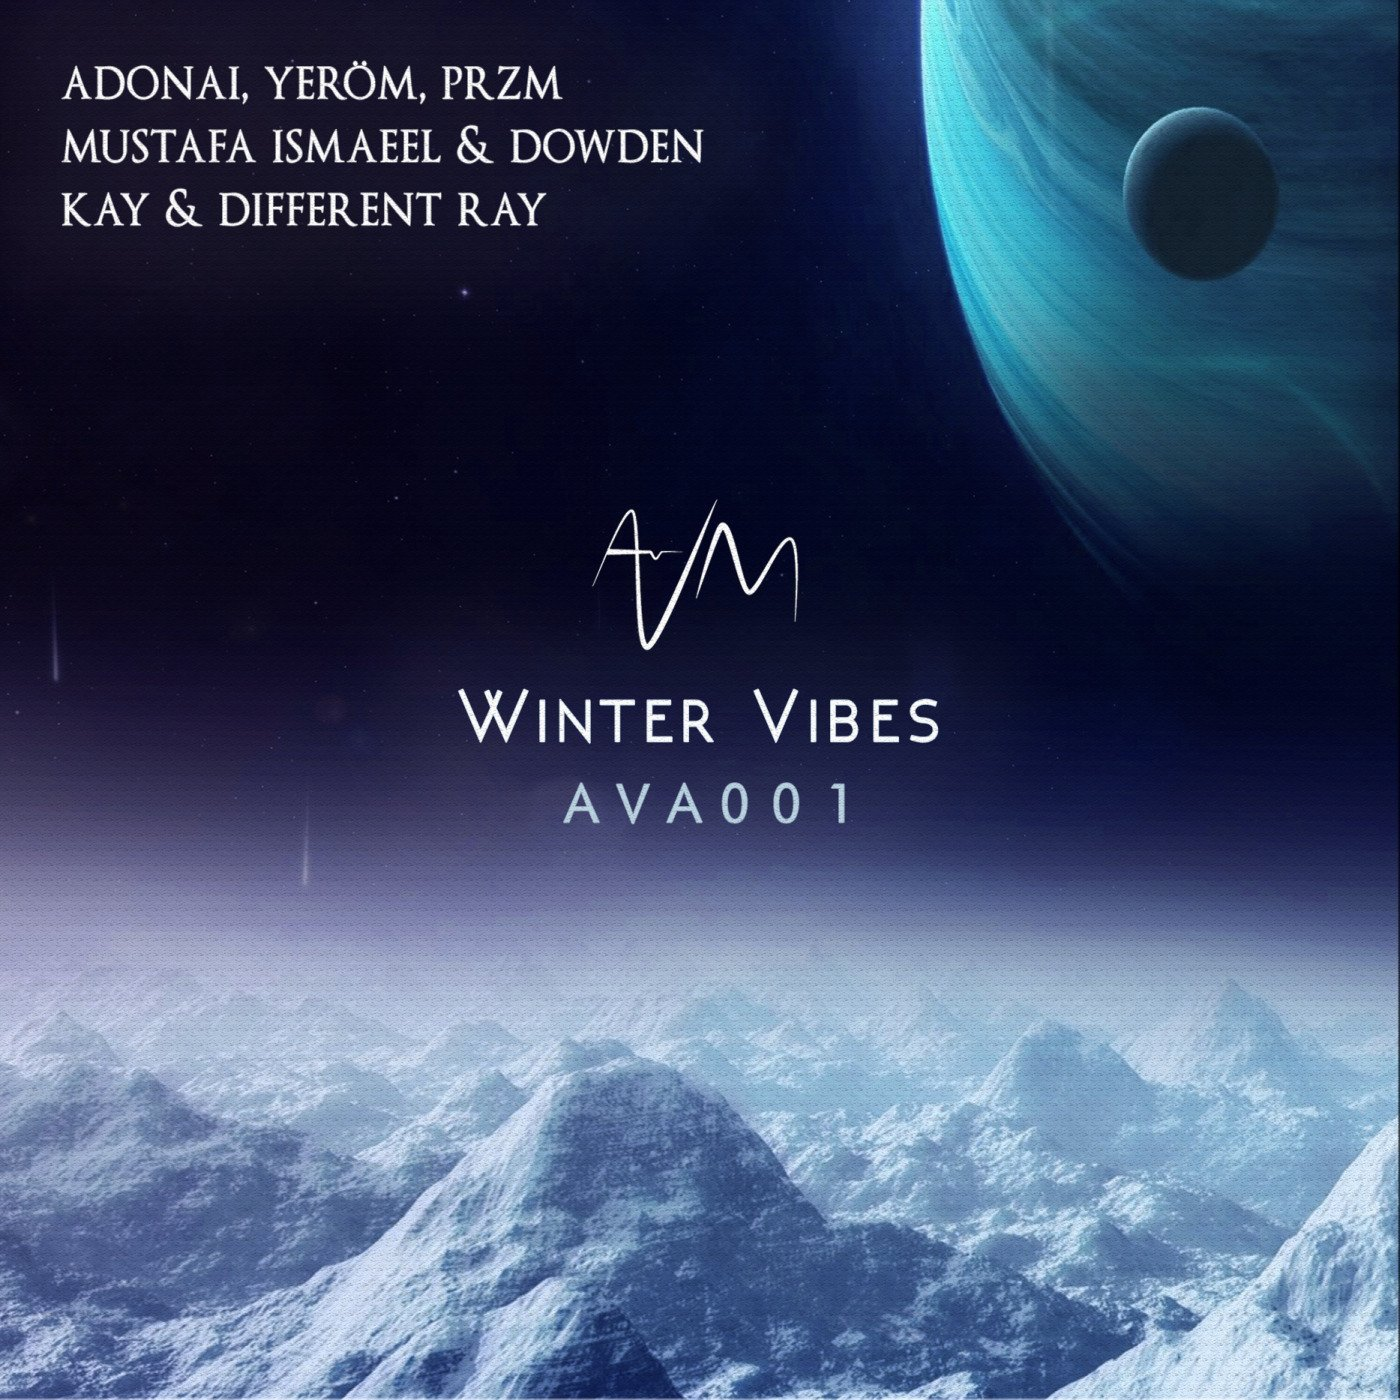 AVA001 - Winter Vibes VA